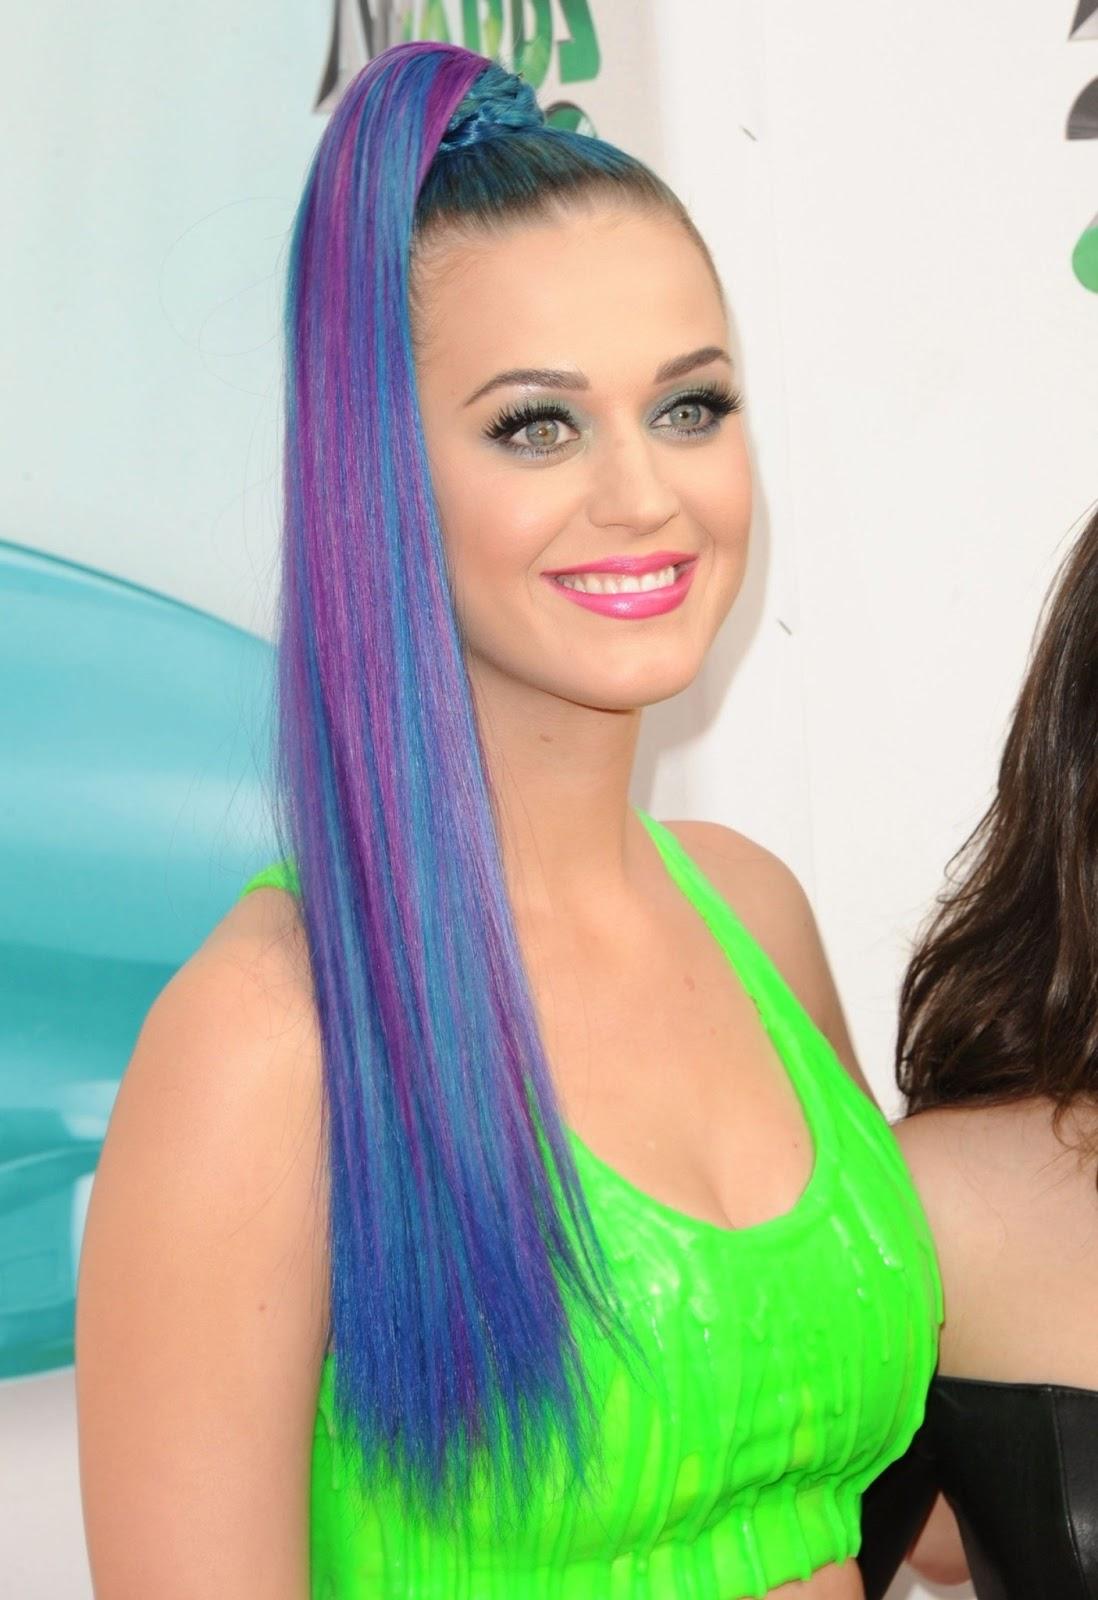 Katy Perry: Katy Perry Greenhair Katy Perry